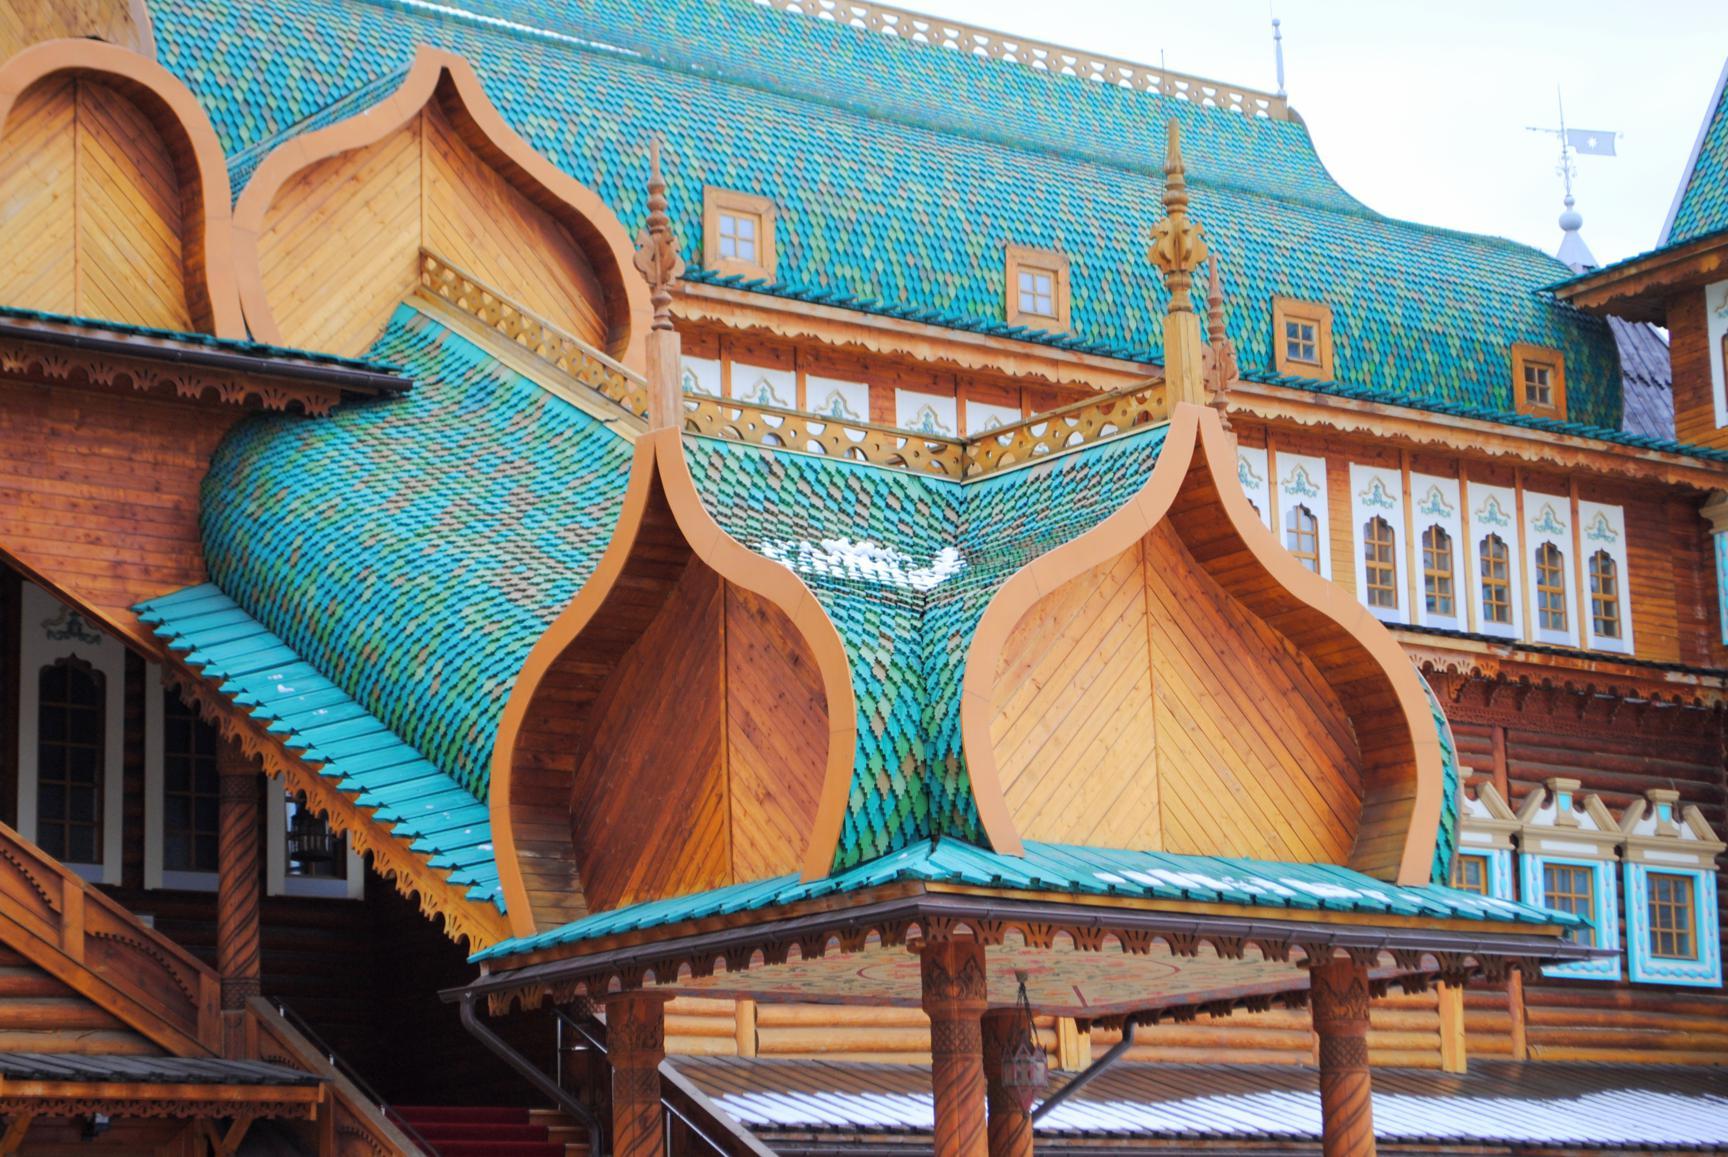 kolomenskoye-palacio-zar-mikhailovich-3